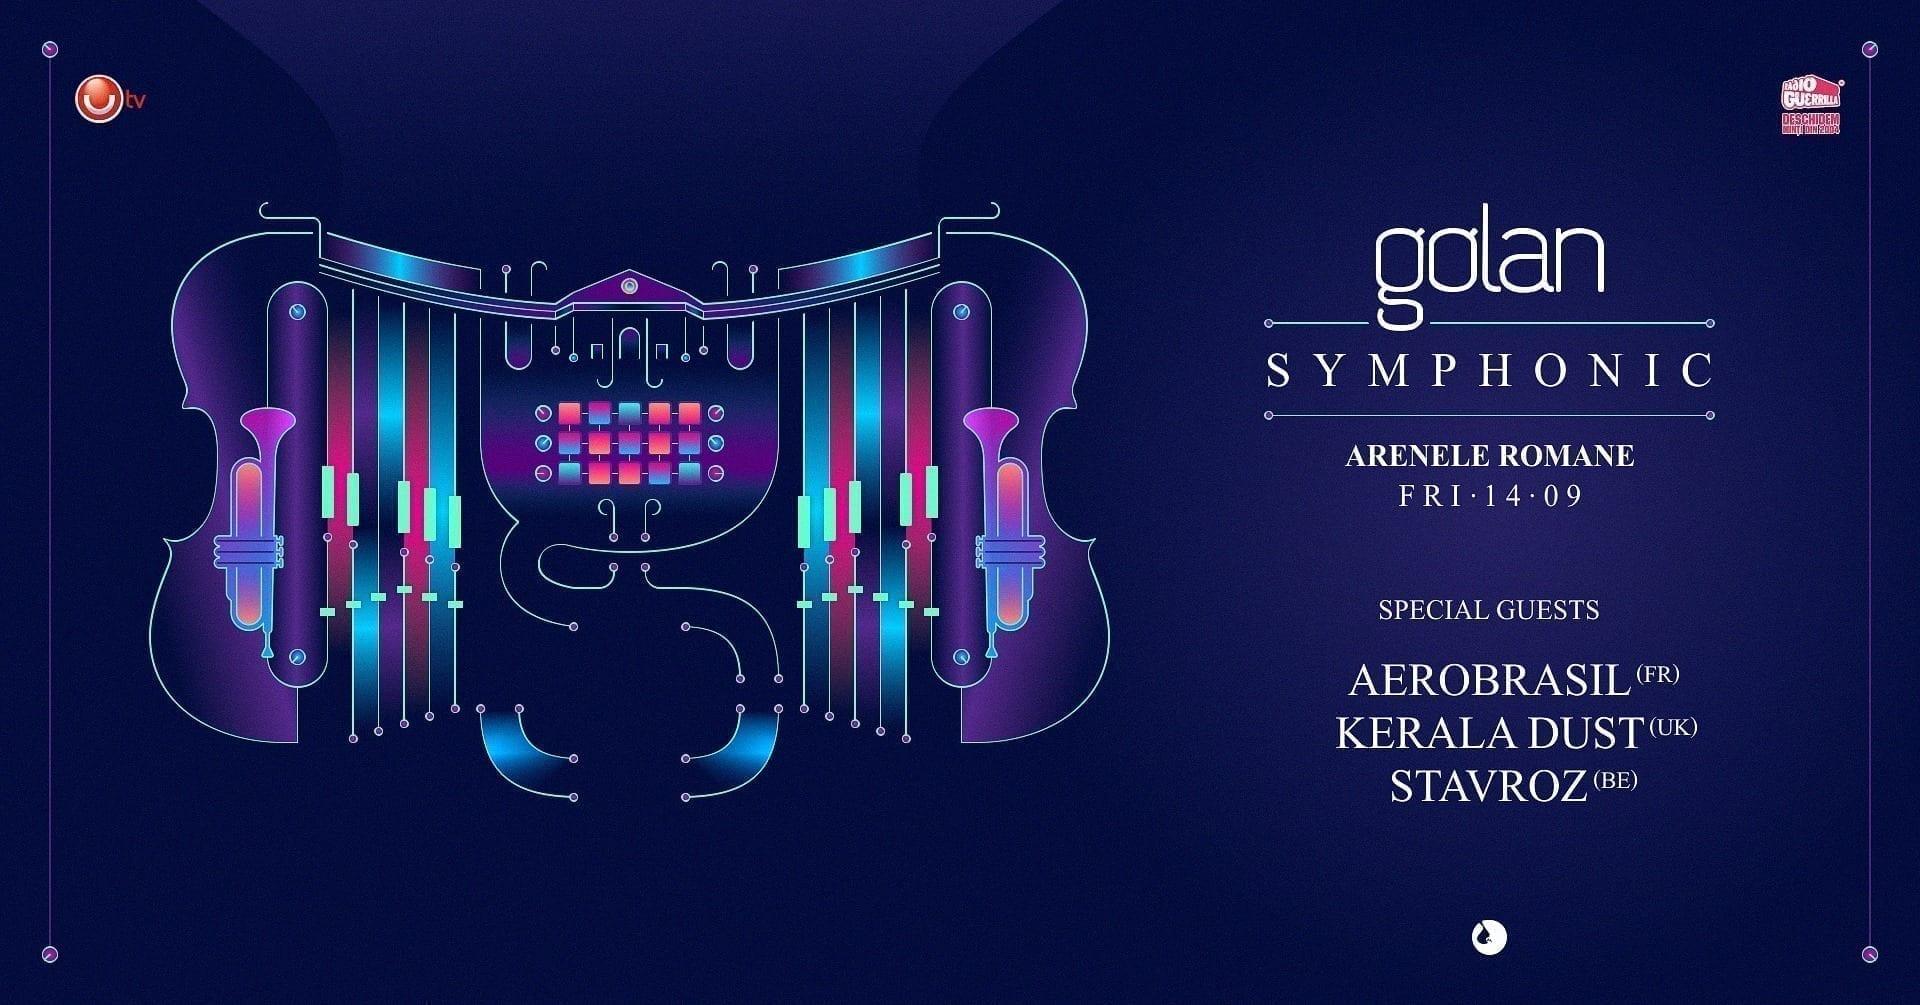 Golan Symphonic 3.0 with Aerobrasil, Kerala Dust, Stavroz live